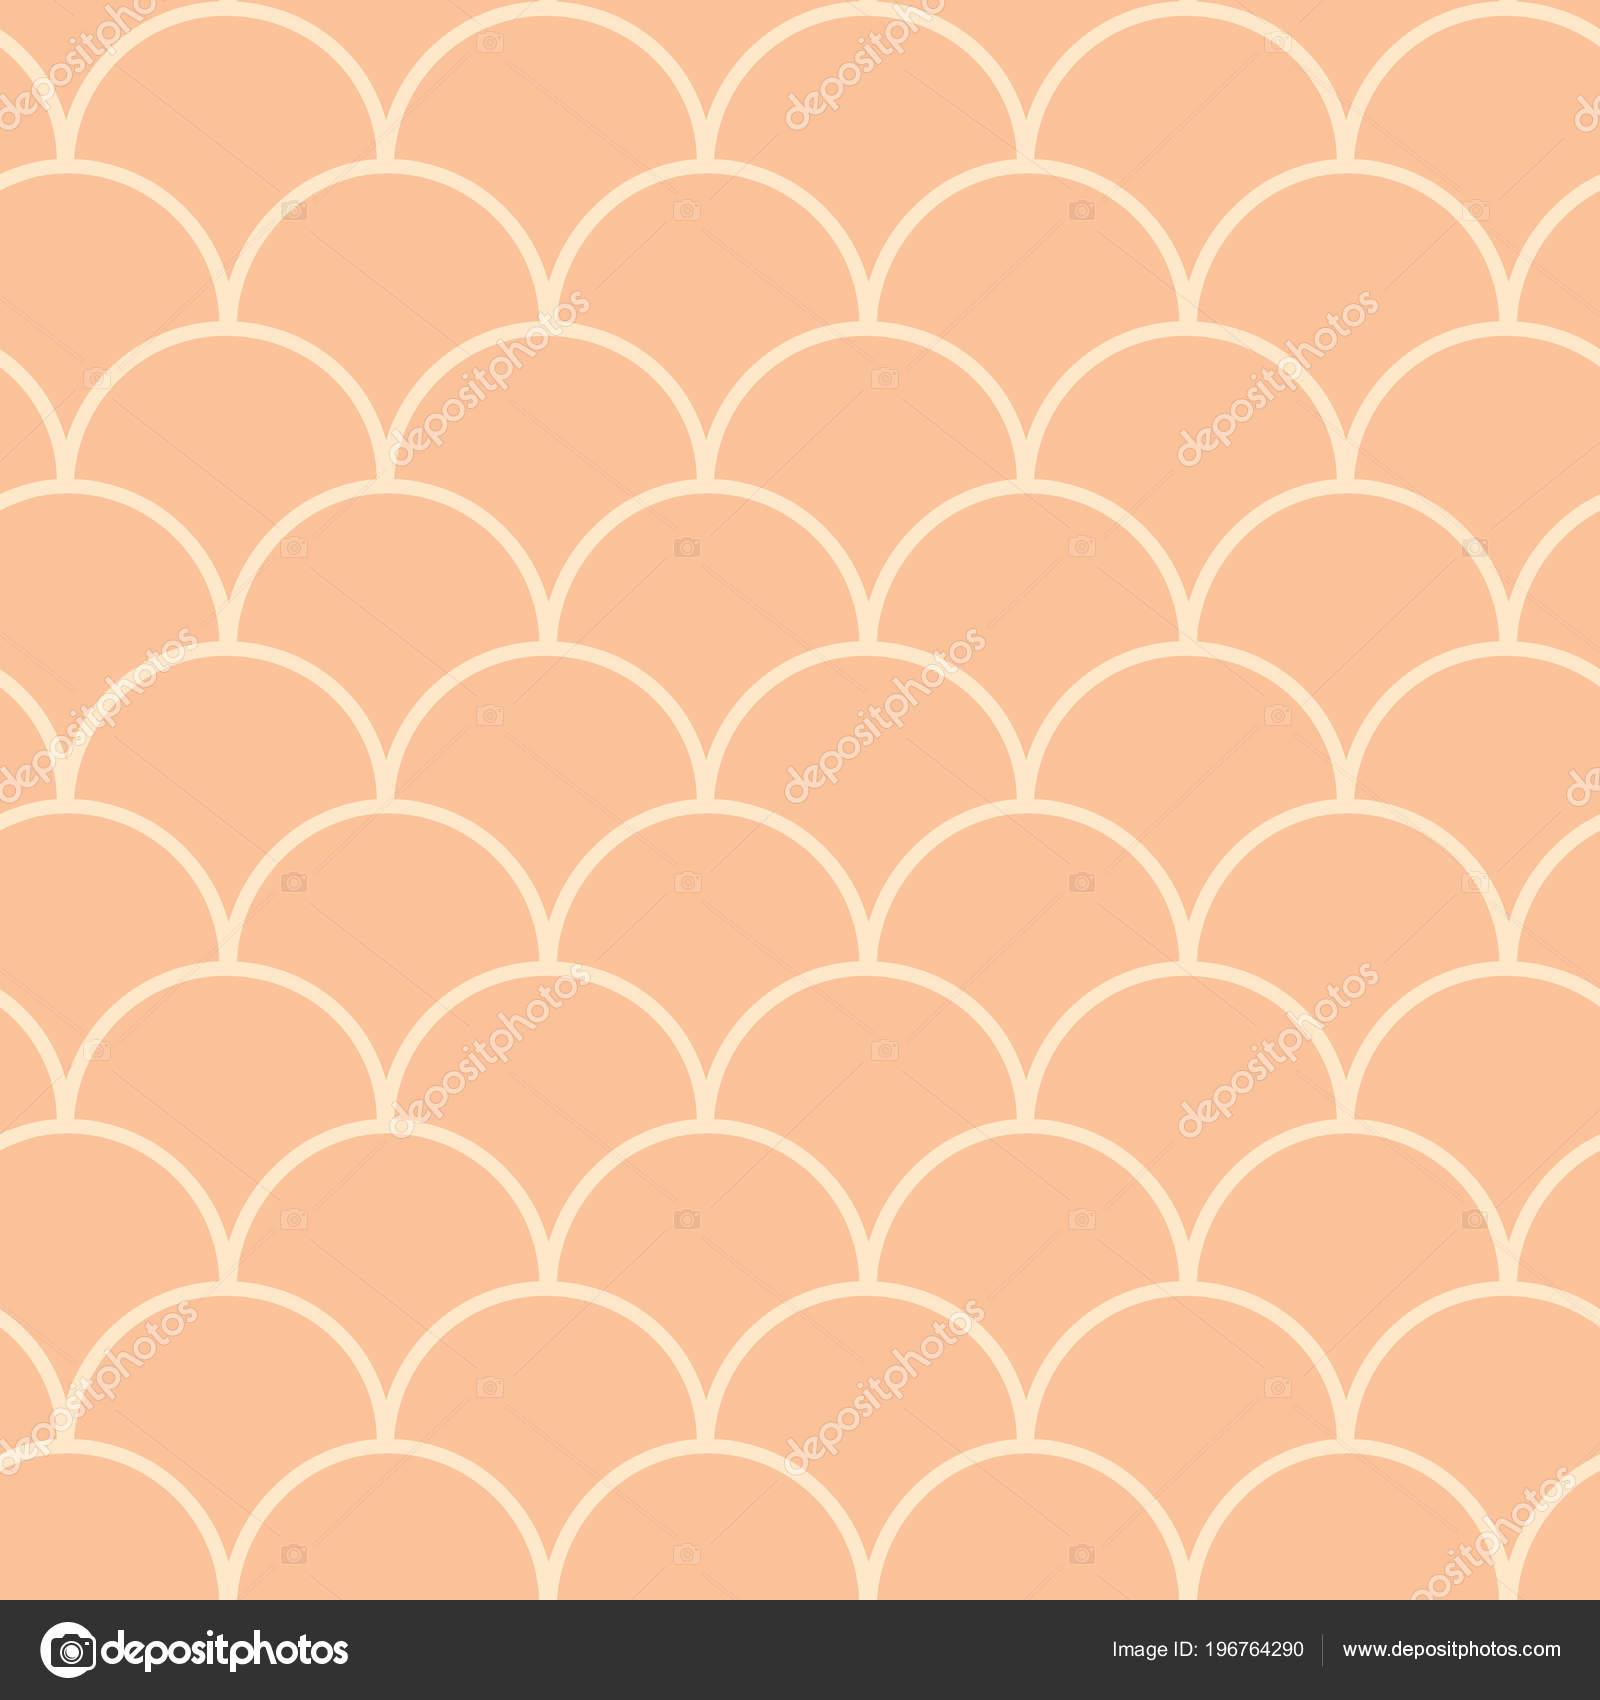 Mermaid Pattern Wallpaper Mermaid Tail Seamless Pattern